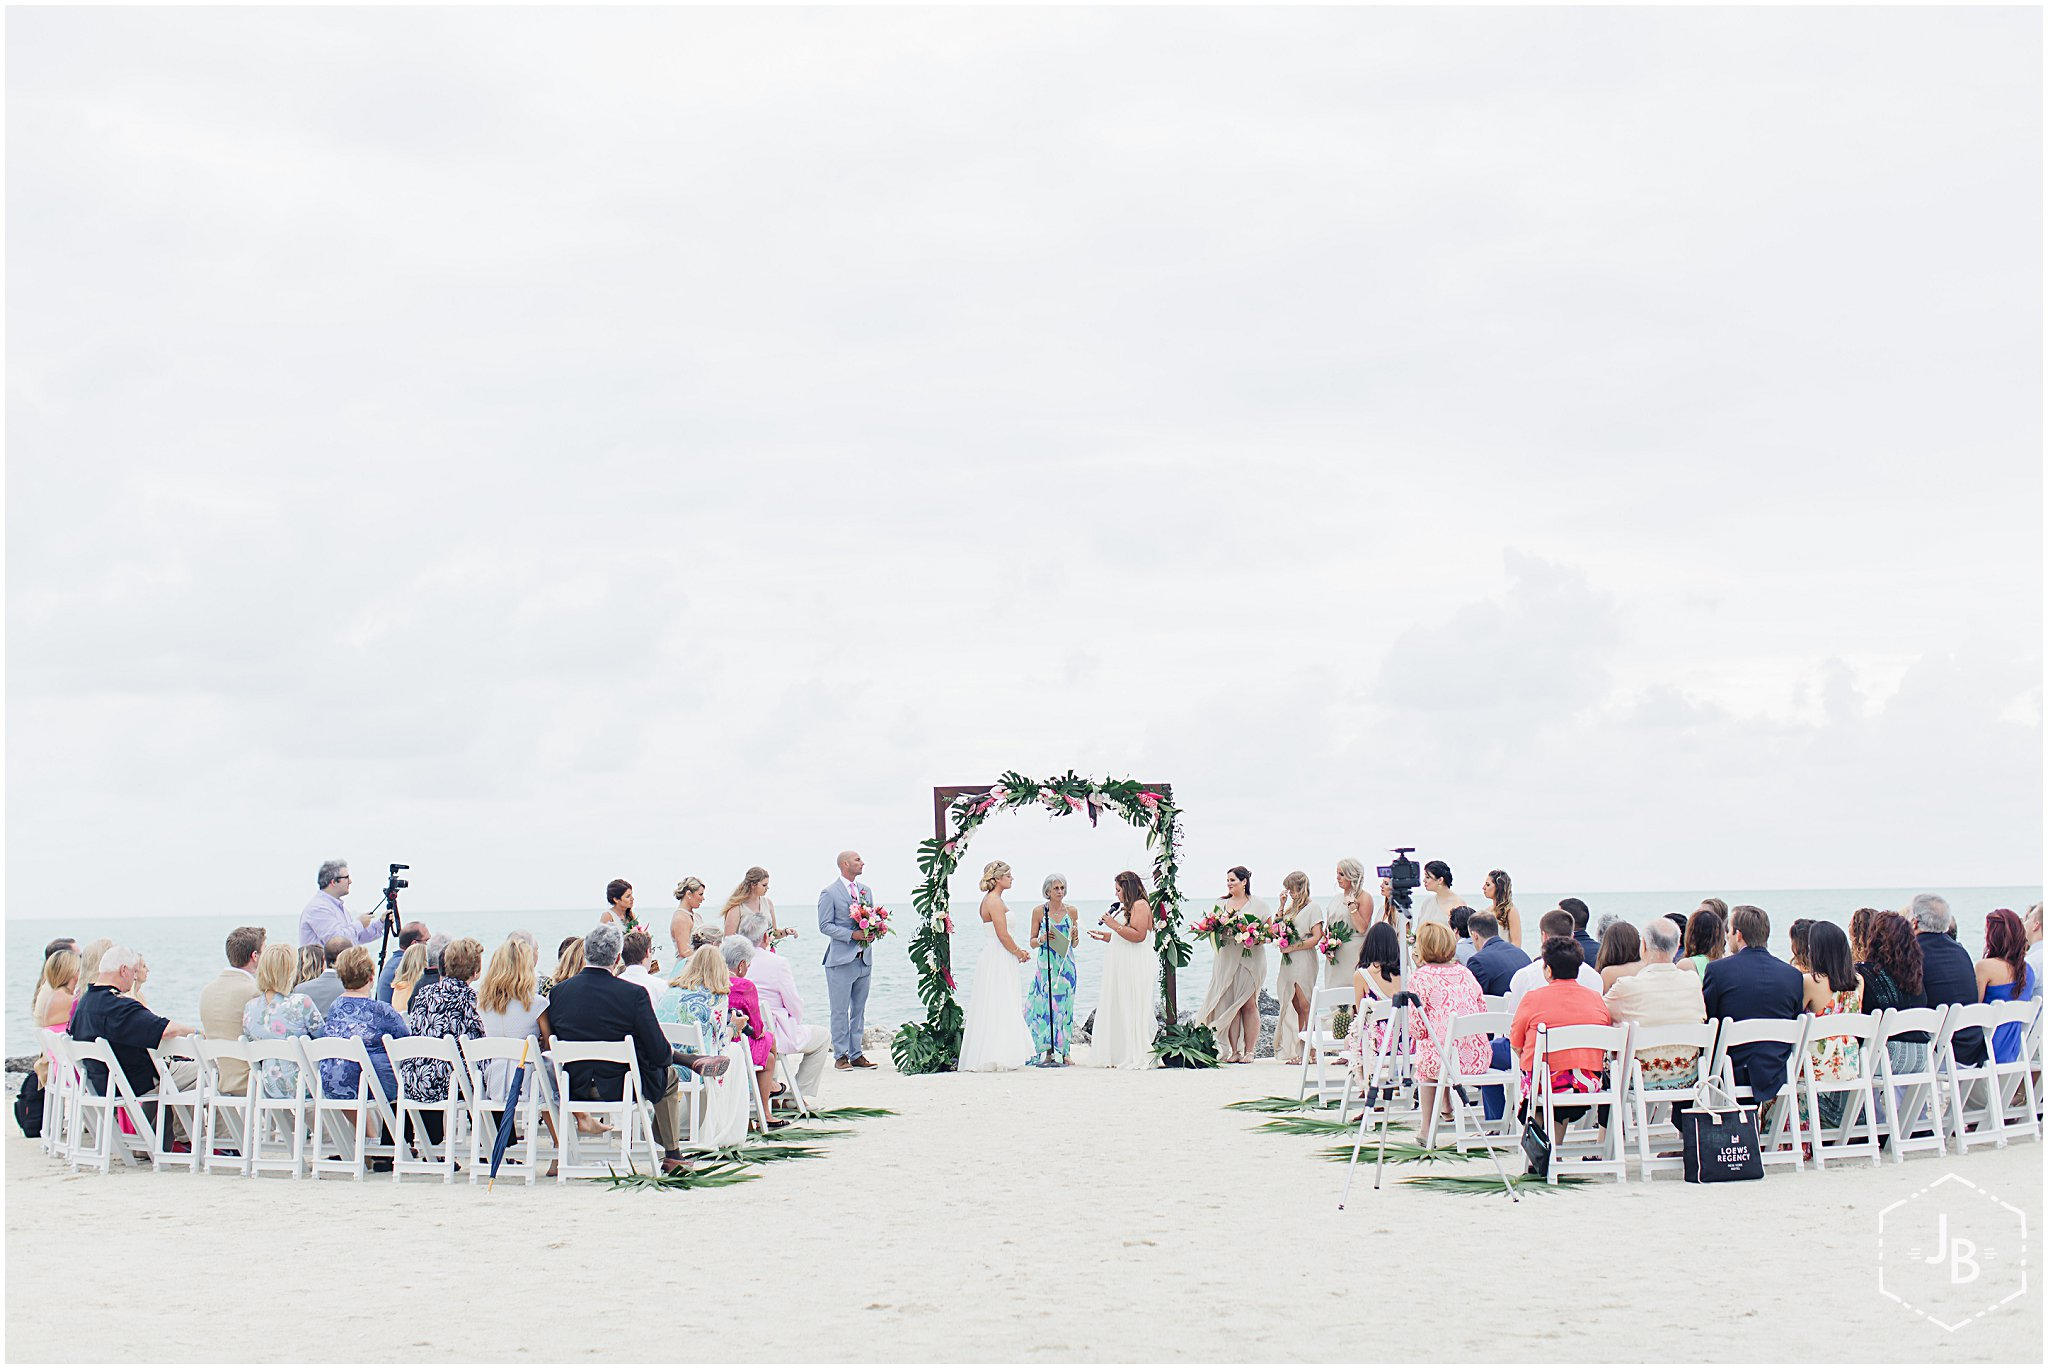 WeddingandEngagementFloridaPhotographer_1470.jpg